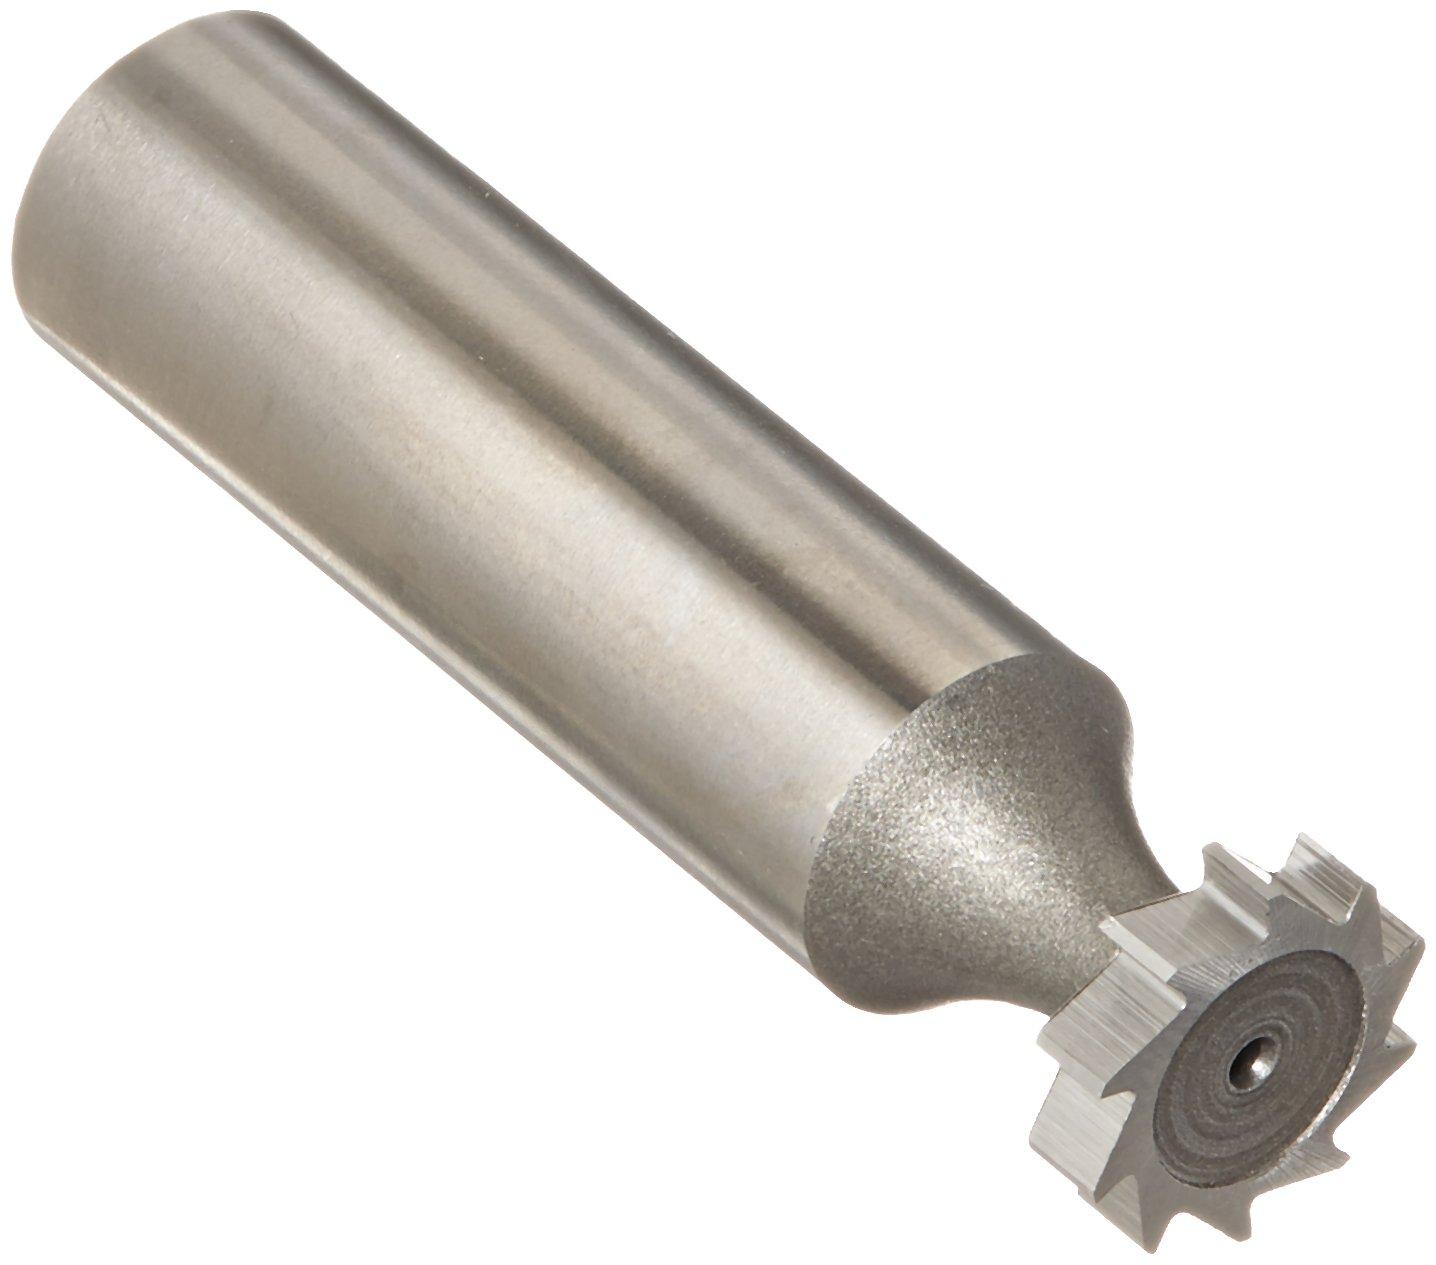 KEO 64040 High-Speed Steel Woodruff Keyseat Cutter, Uncoated (Bright) Finish, Round Shank, 1/2'' Shank Diameter, 1/2'' Cutter Diameter, 10 Straight Teeth, 1/8'' Face Width